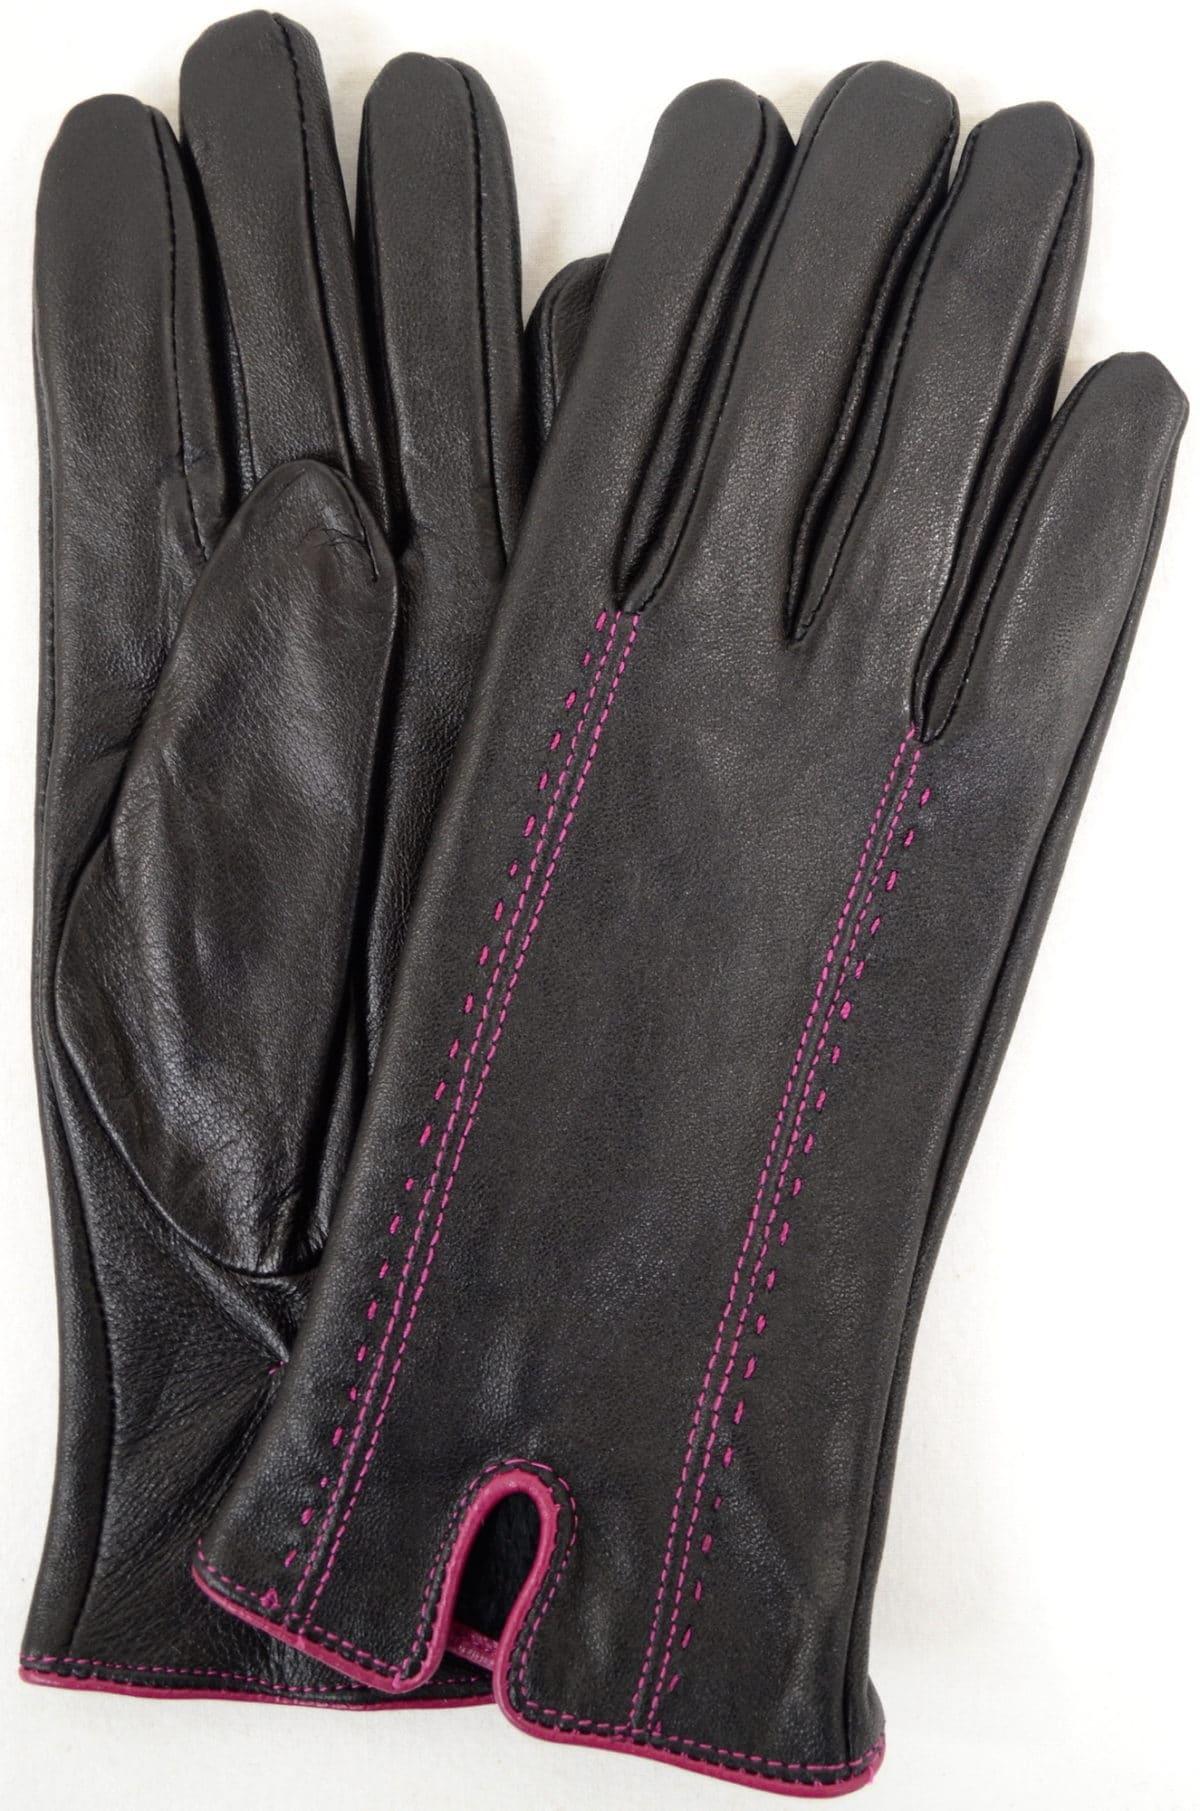 Caitlin - Leather Glove Attractive Stitch Design - Pink